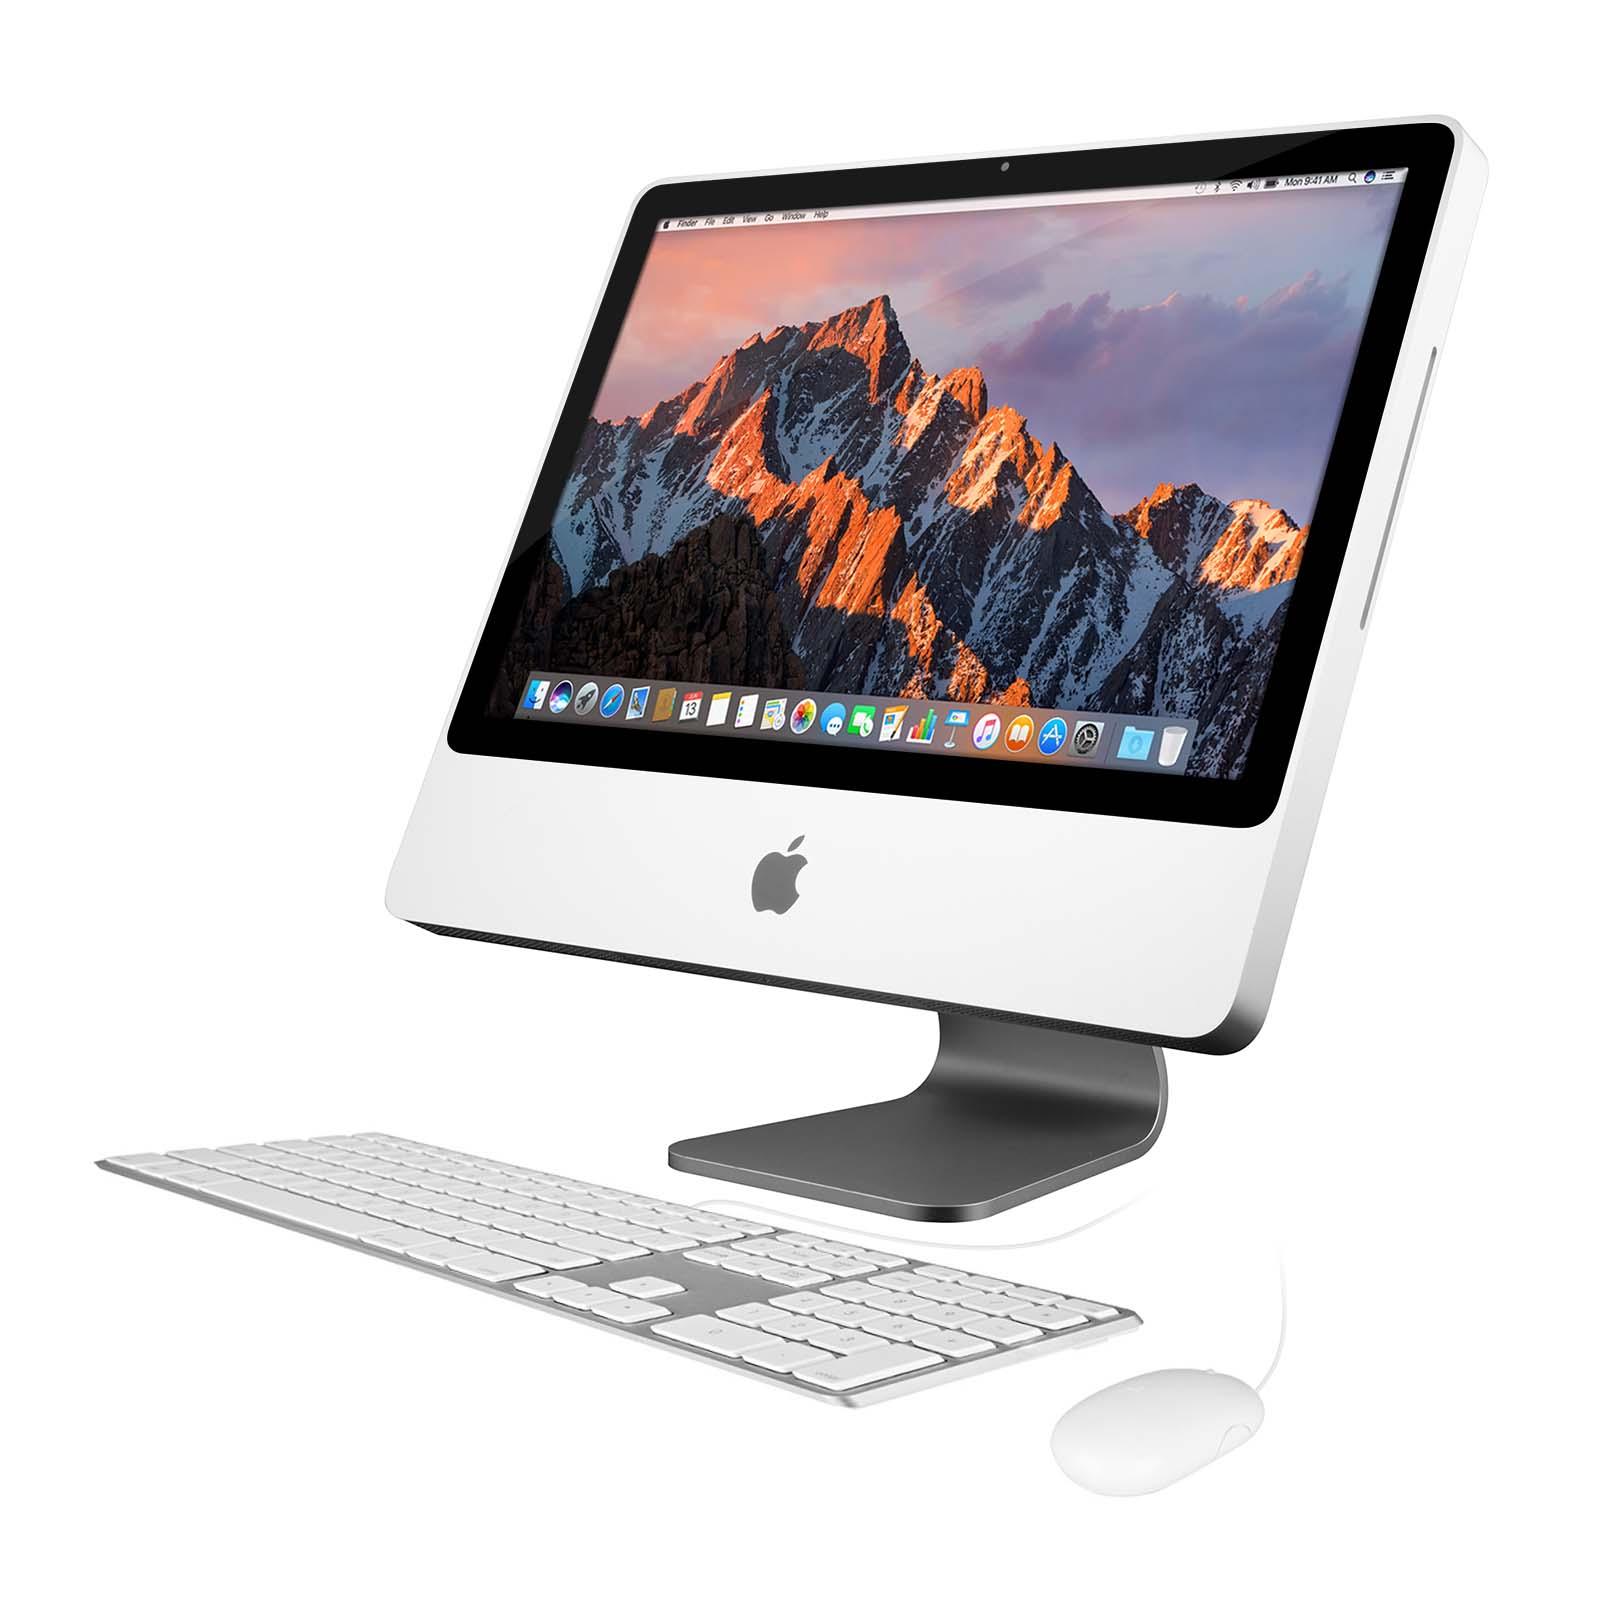 "Apple 20"" iMac MA877LL/A, Core 2 Duo 2.4 GHz, 250GB HDD ..."